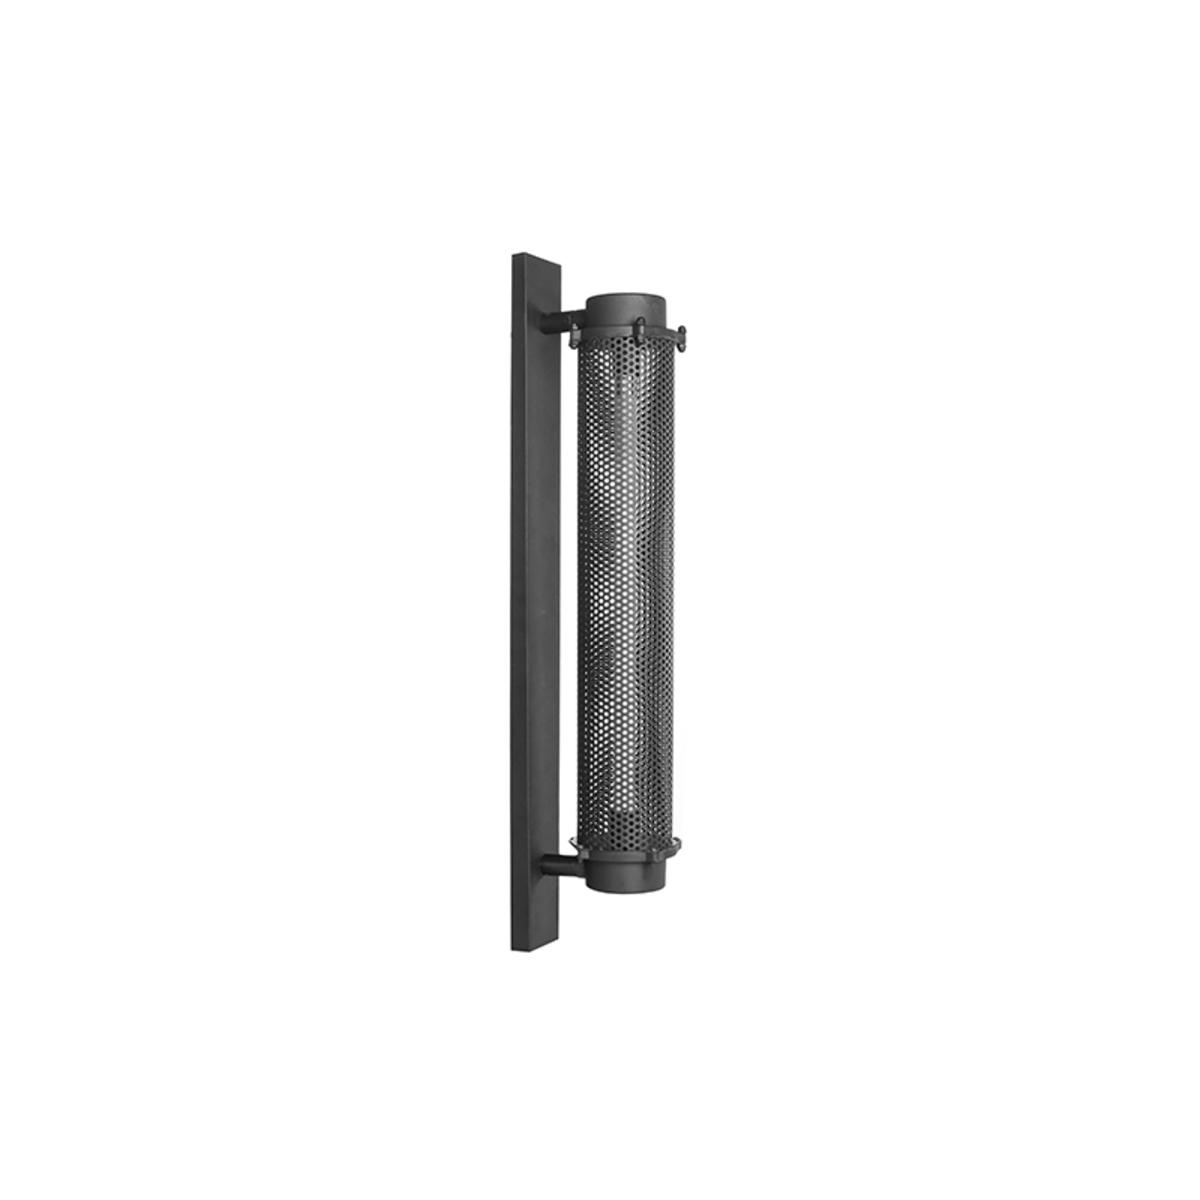 LABEL51 Wandlamp Tube - Zwart - Metaal